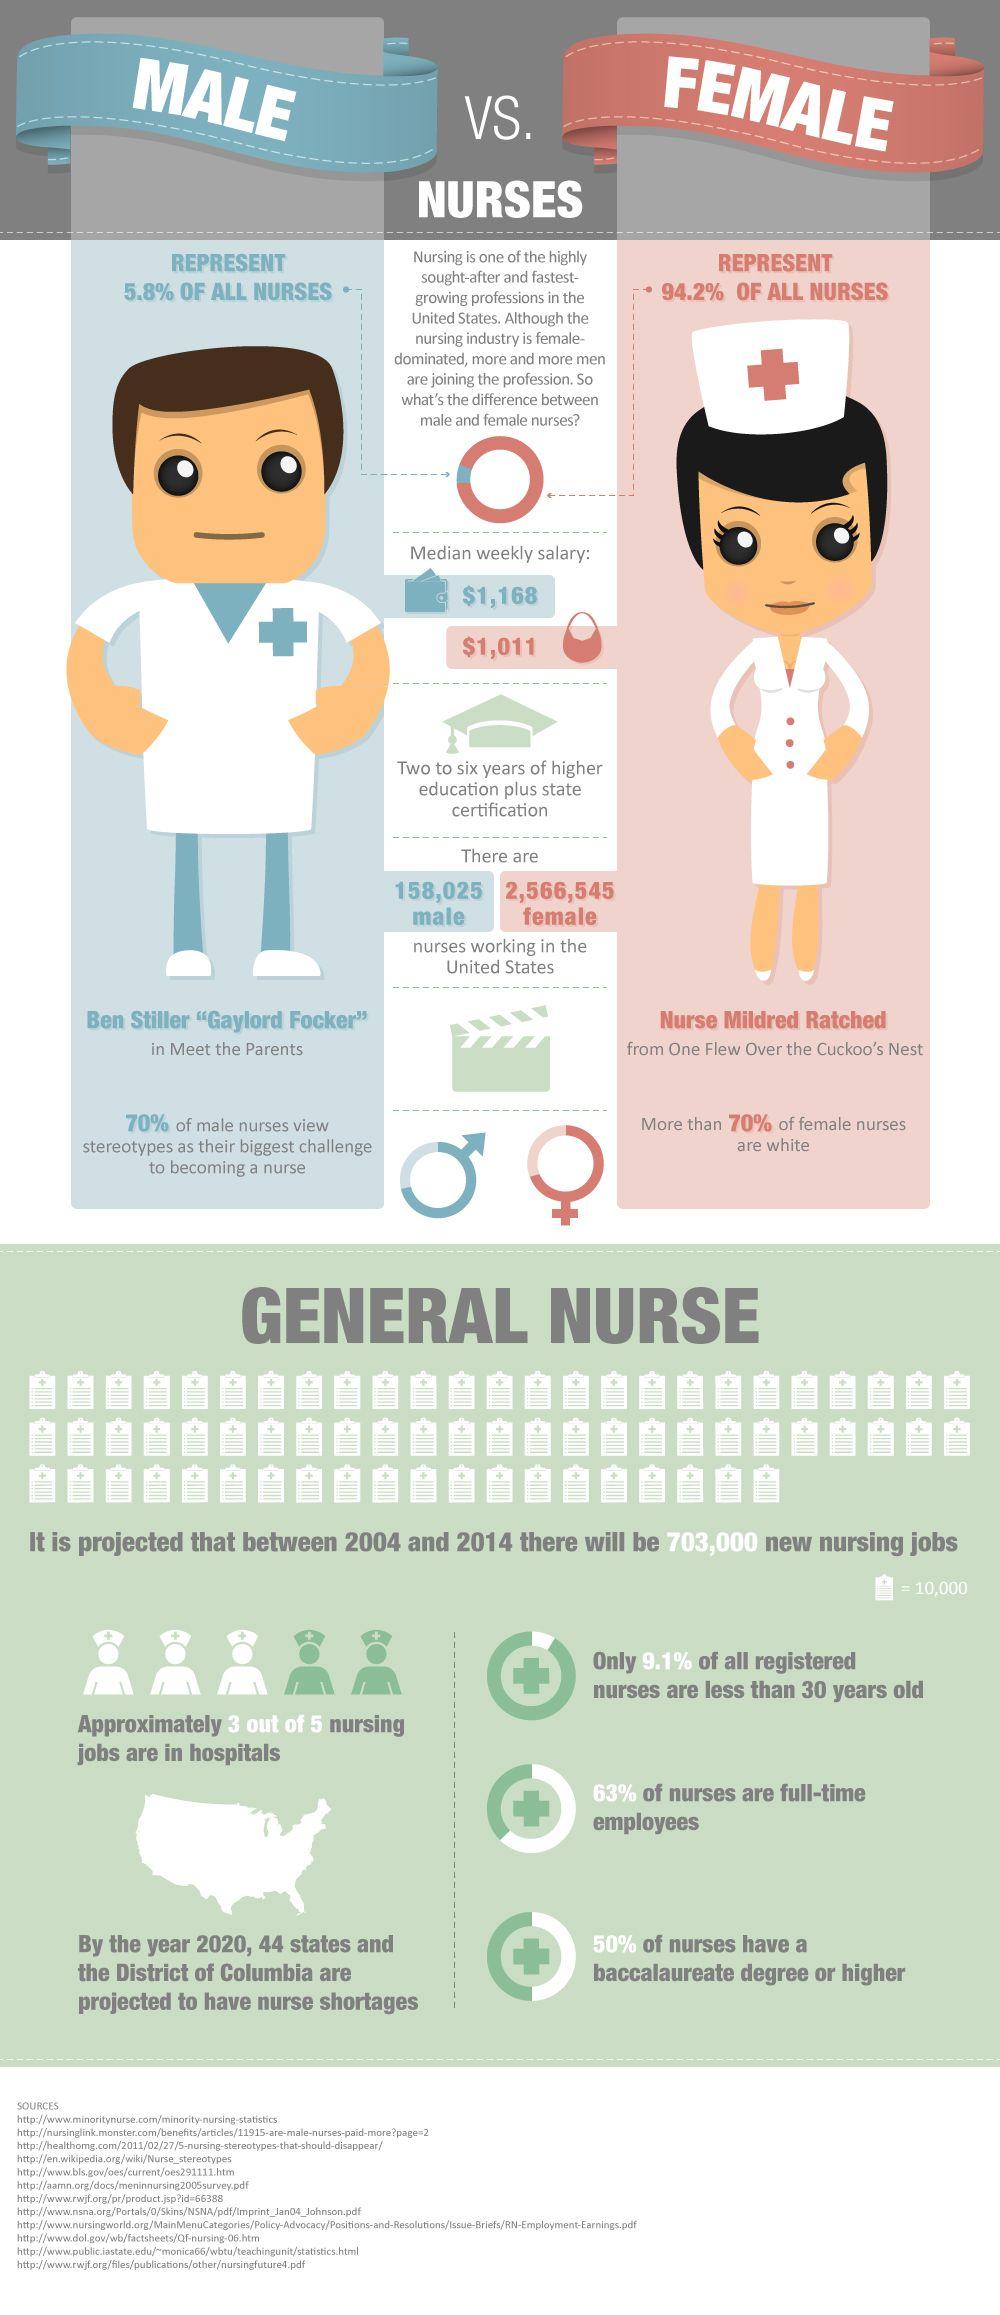 27 Registered Nurse Resume Objective Examples In 2020 Nursing